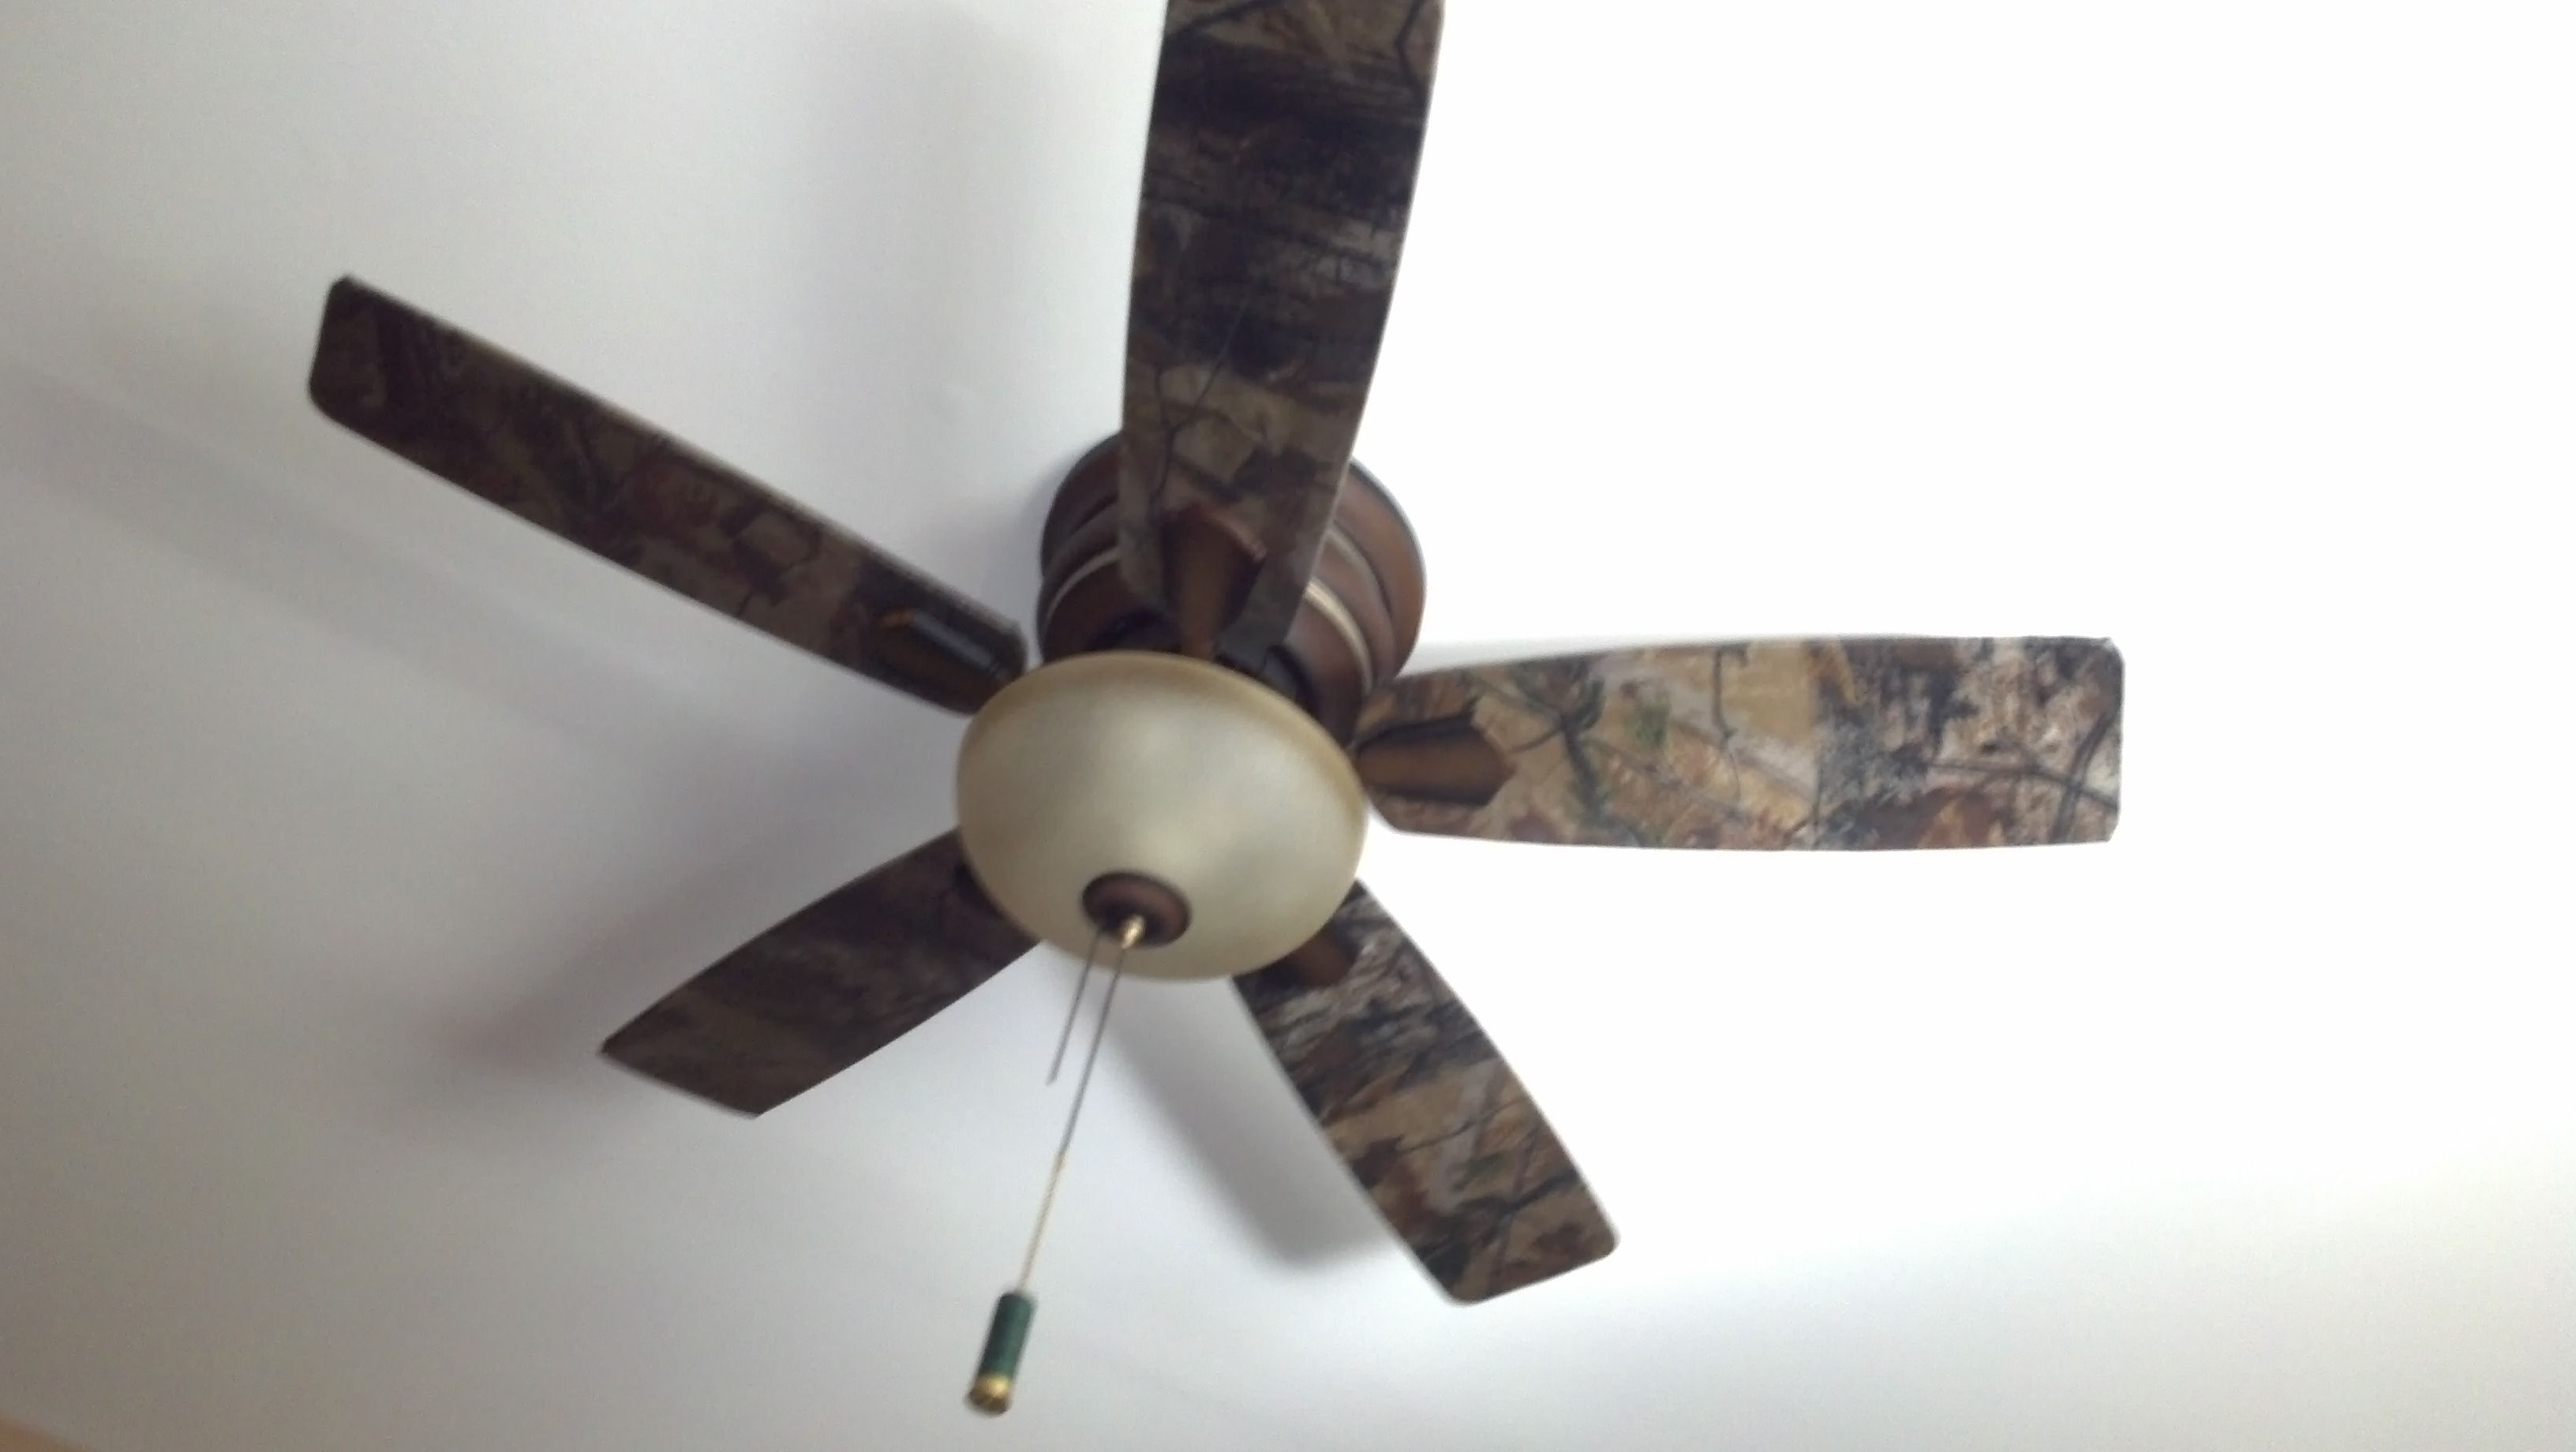 Finished fan modge podged camo fabric onto ceiling fan blades finished fan modge podged camo fabric onto ceiling fan blades aloadofball Choice Image